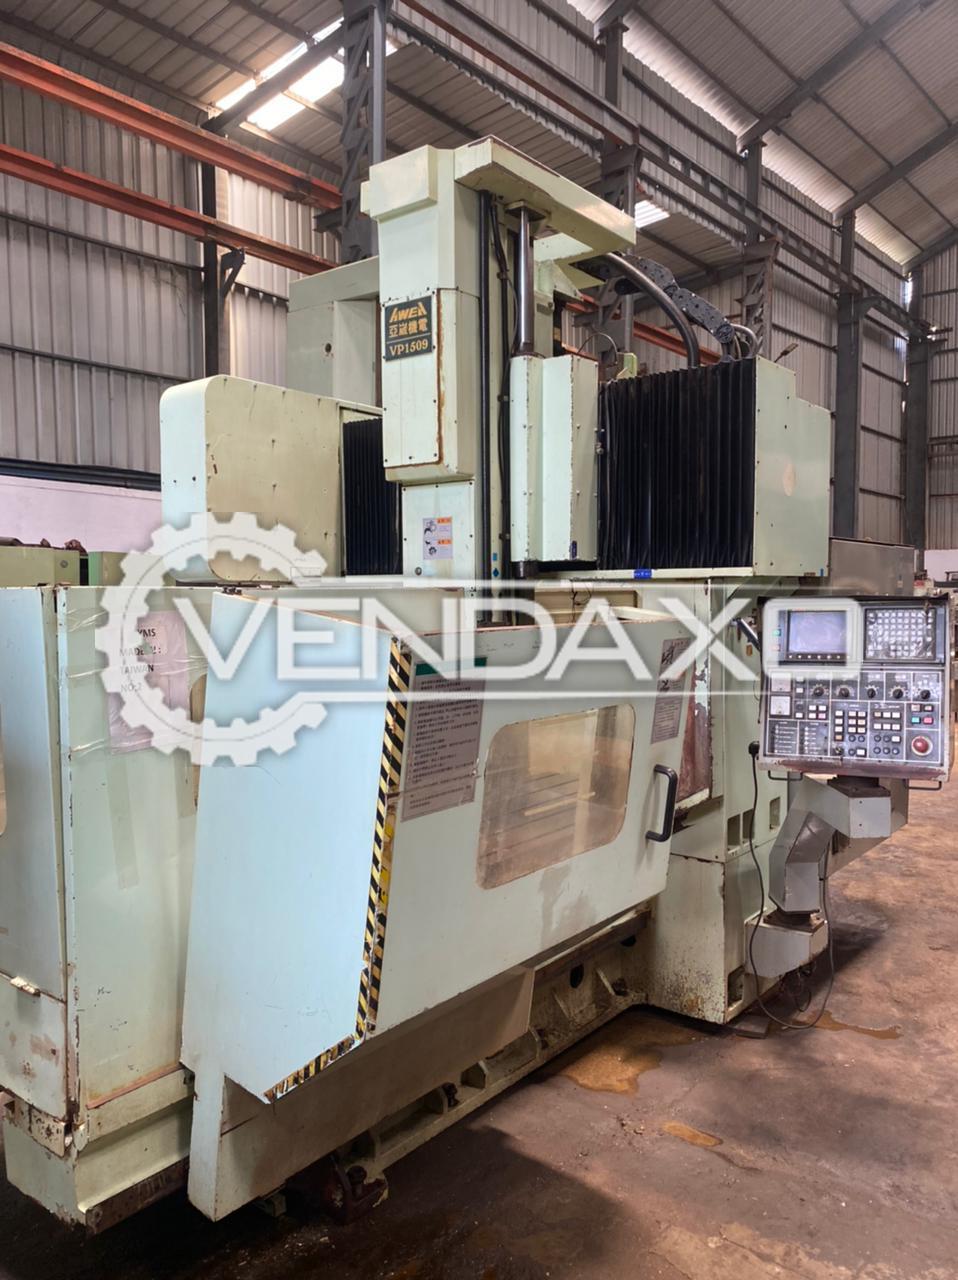 AWEA VP-1509 CNC Double Column Vertical Machining Center VMC - 1500 x 1000 x 760 mm